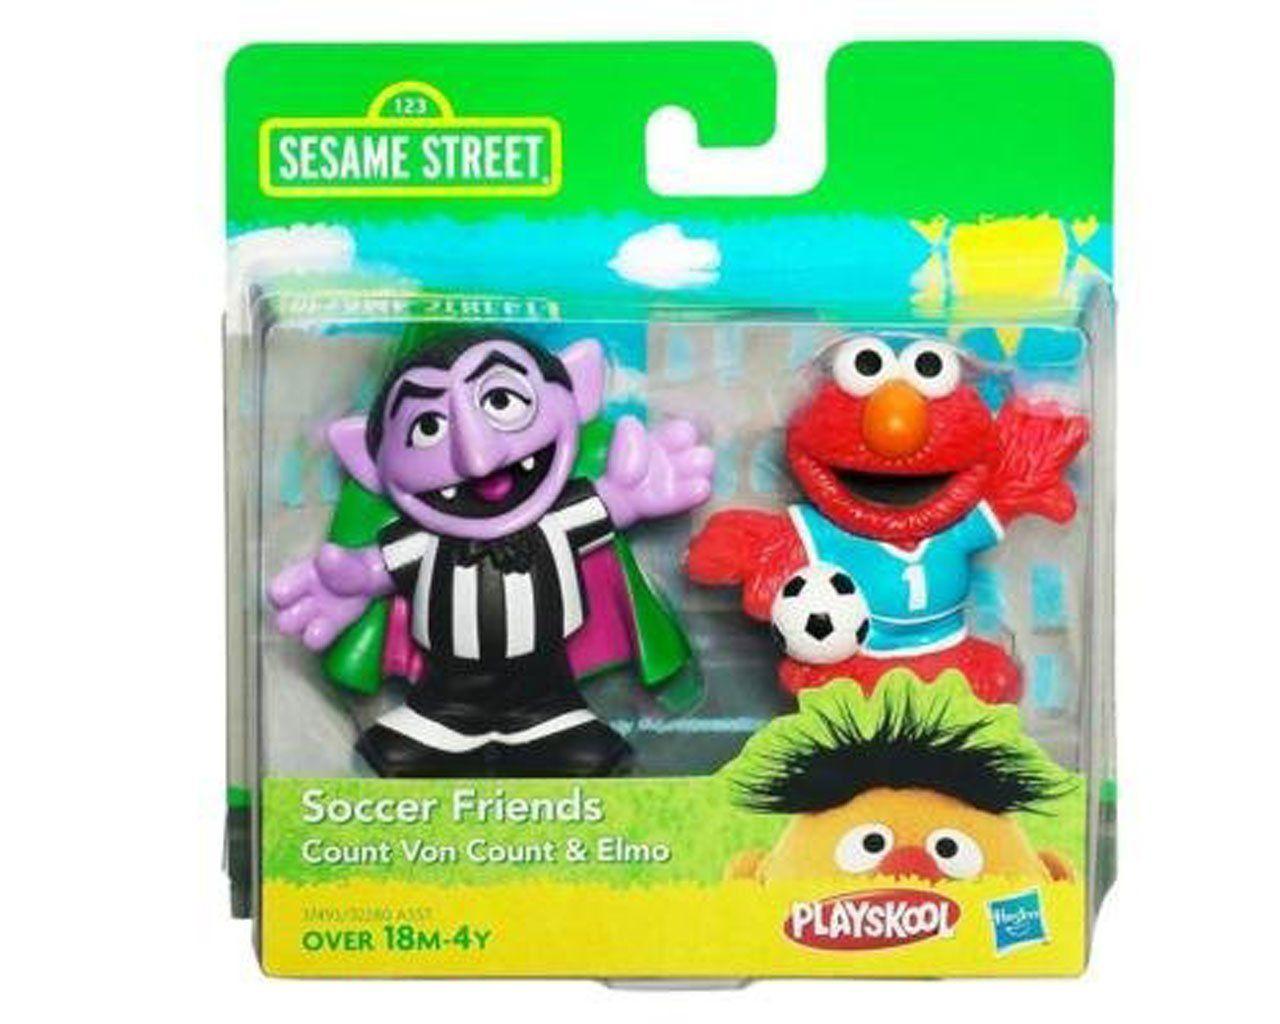 Sesame Street Playskool Soccer Friends Count Von Count